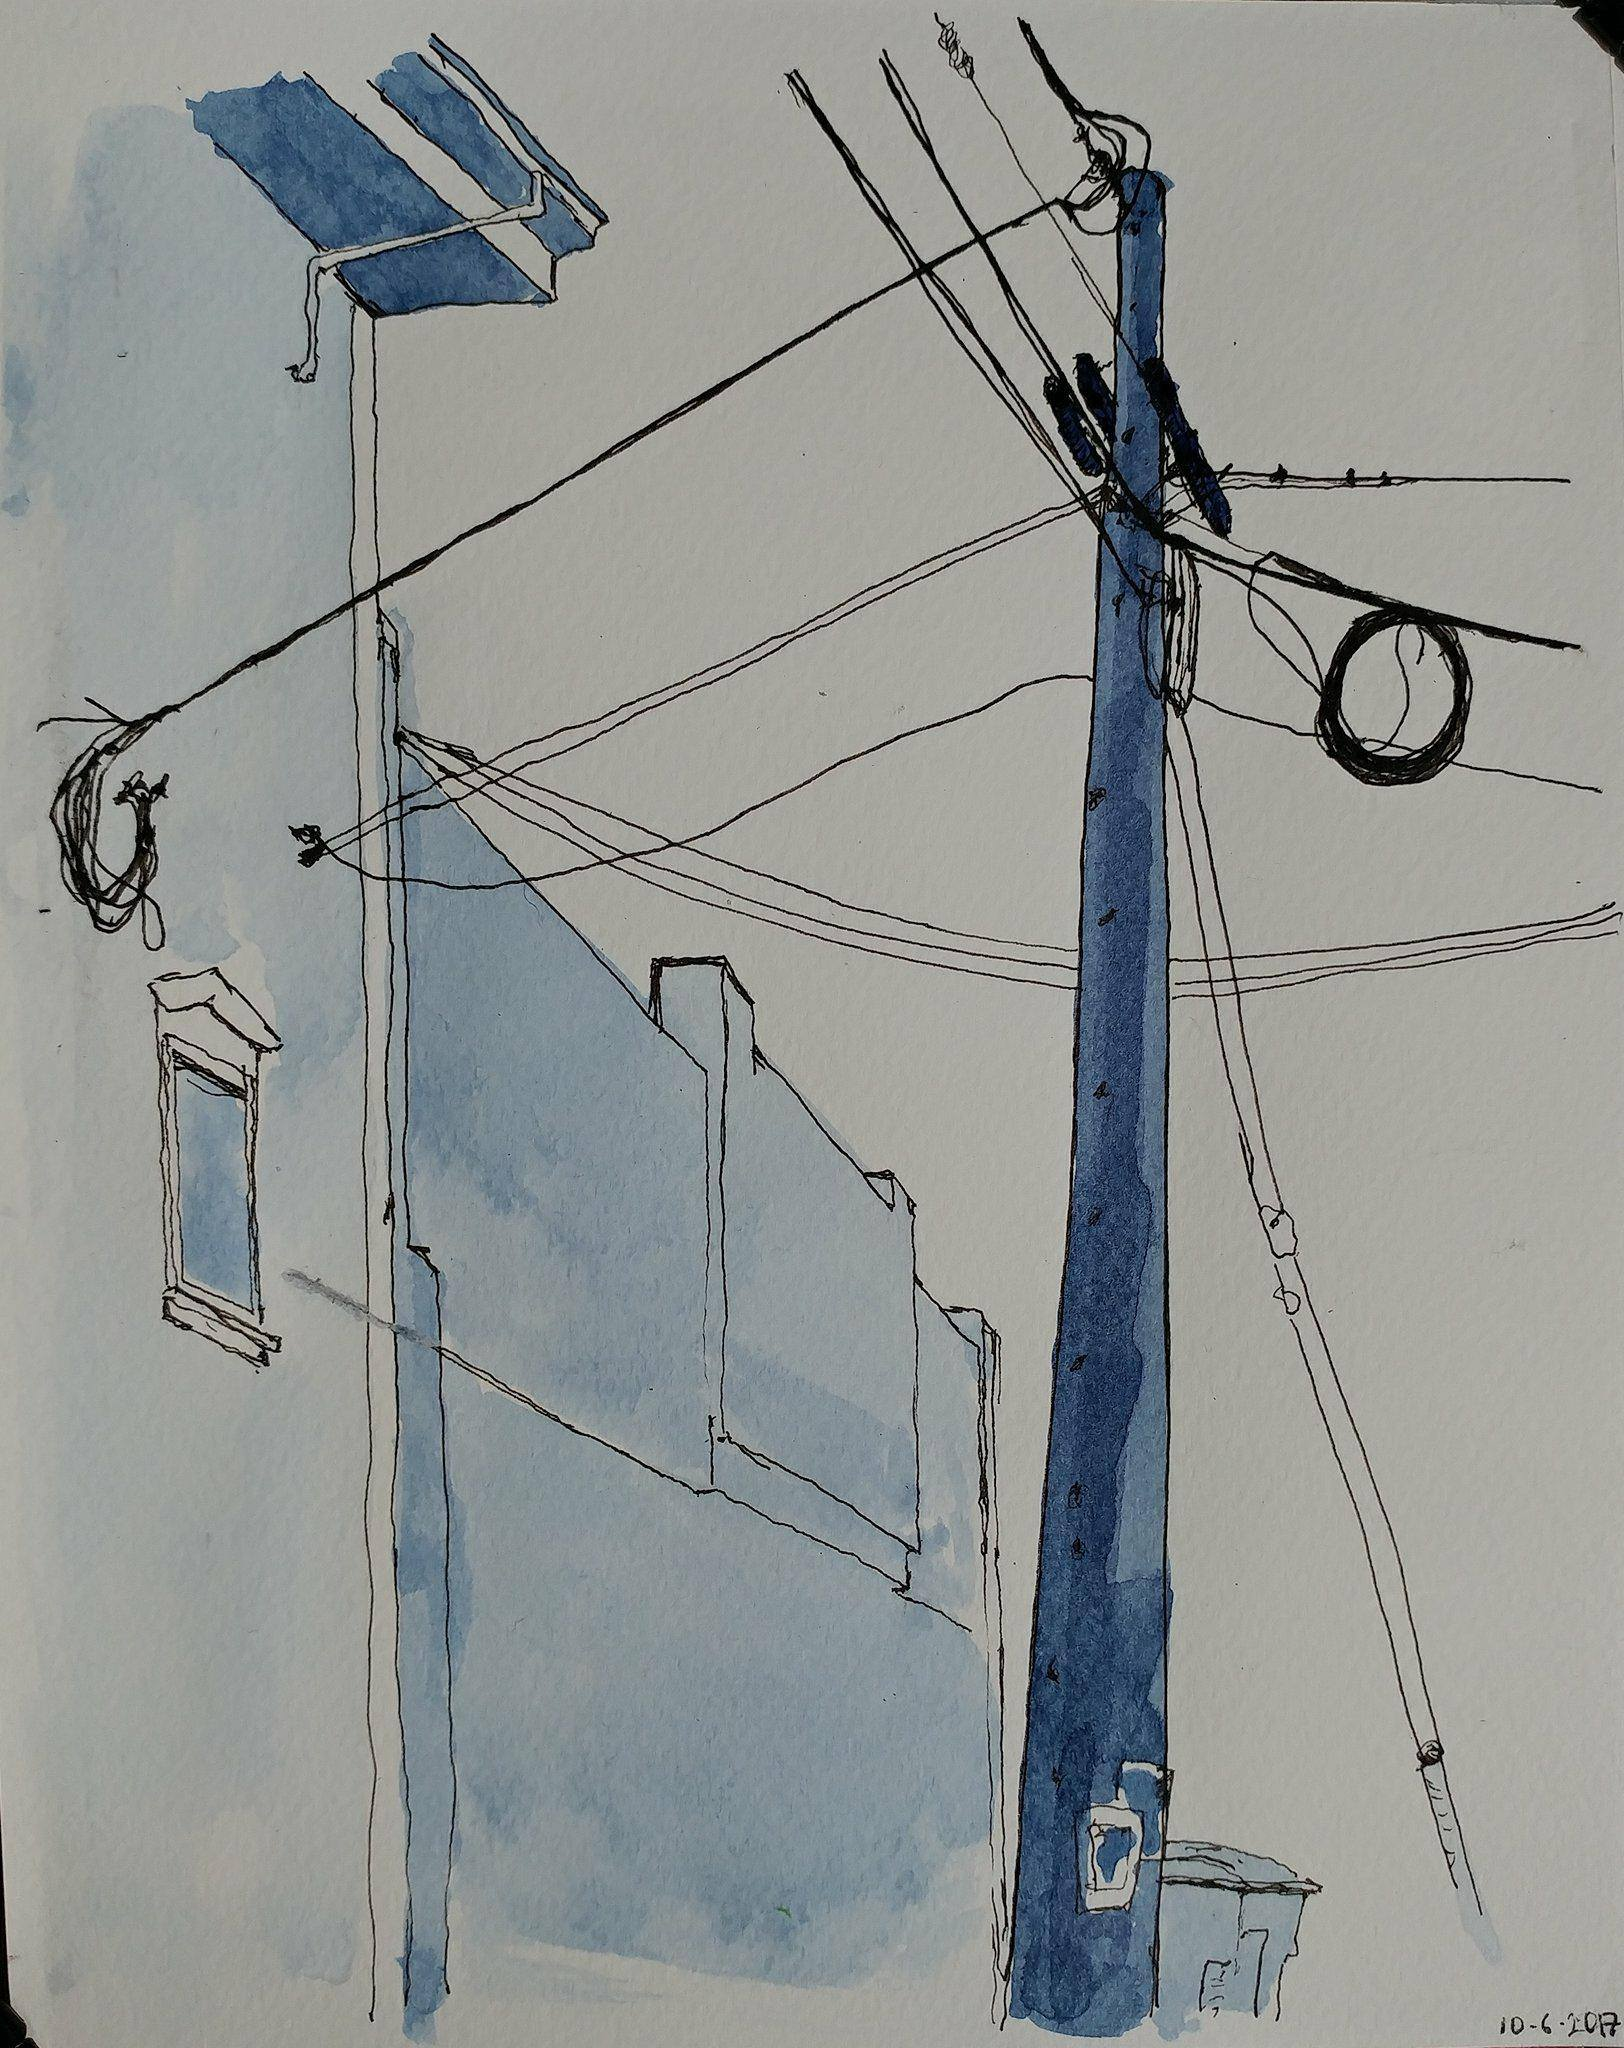 Noriega Blue